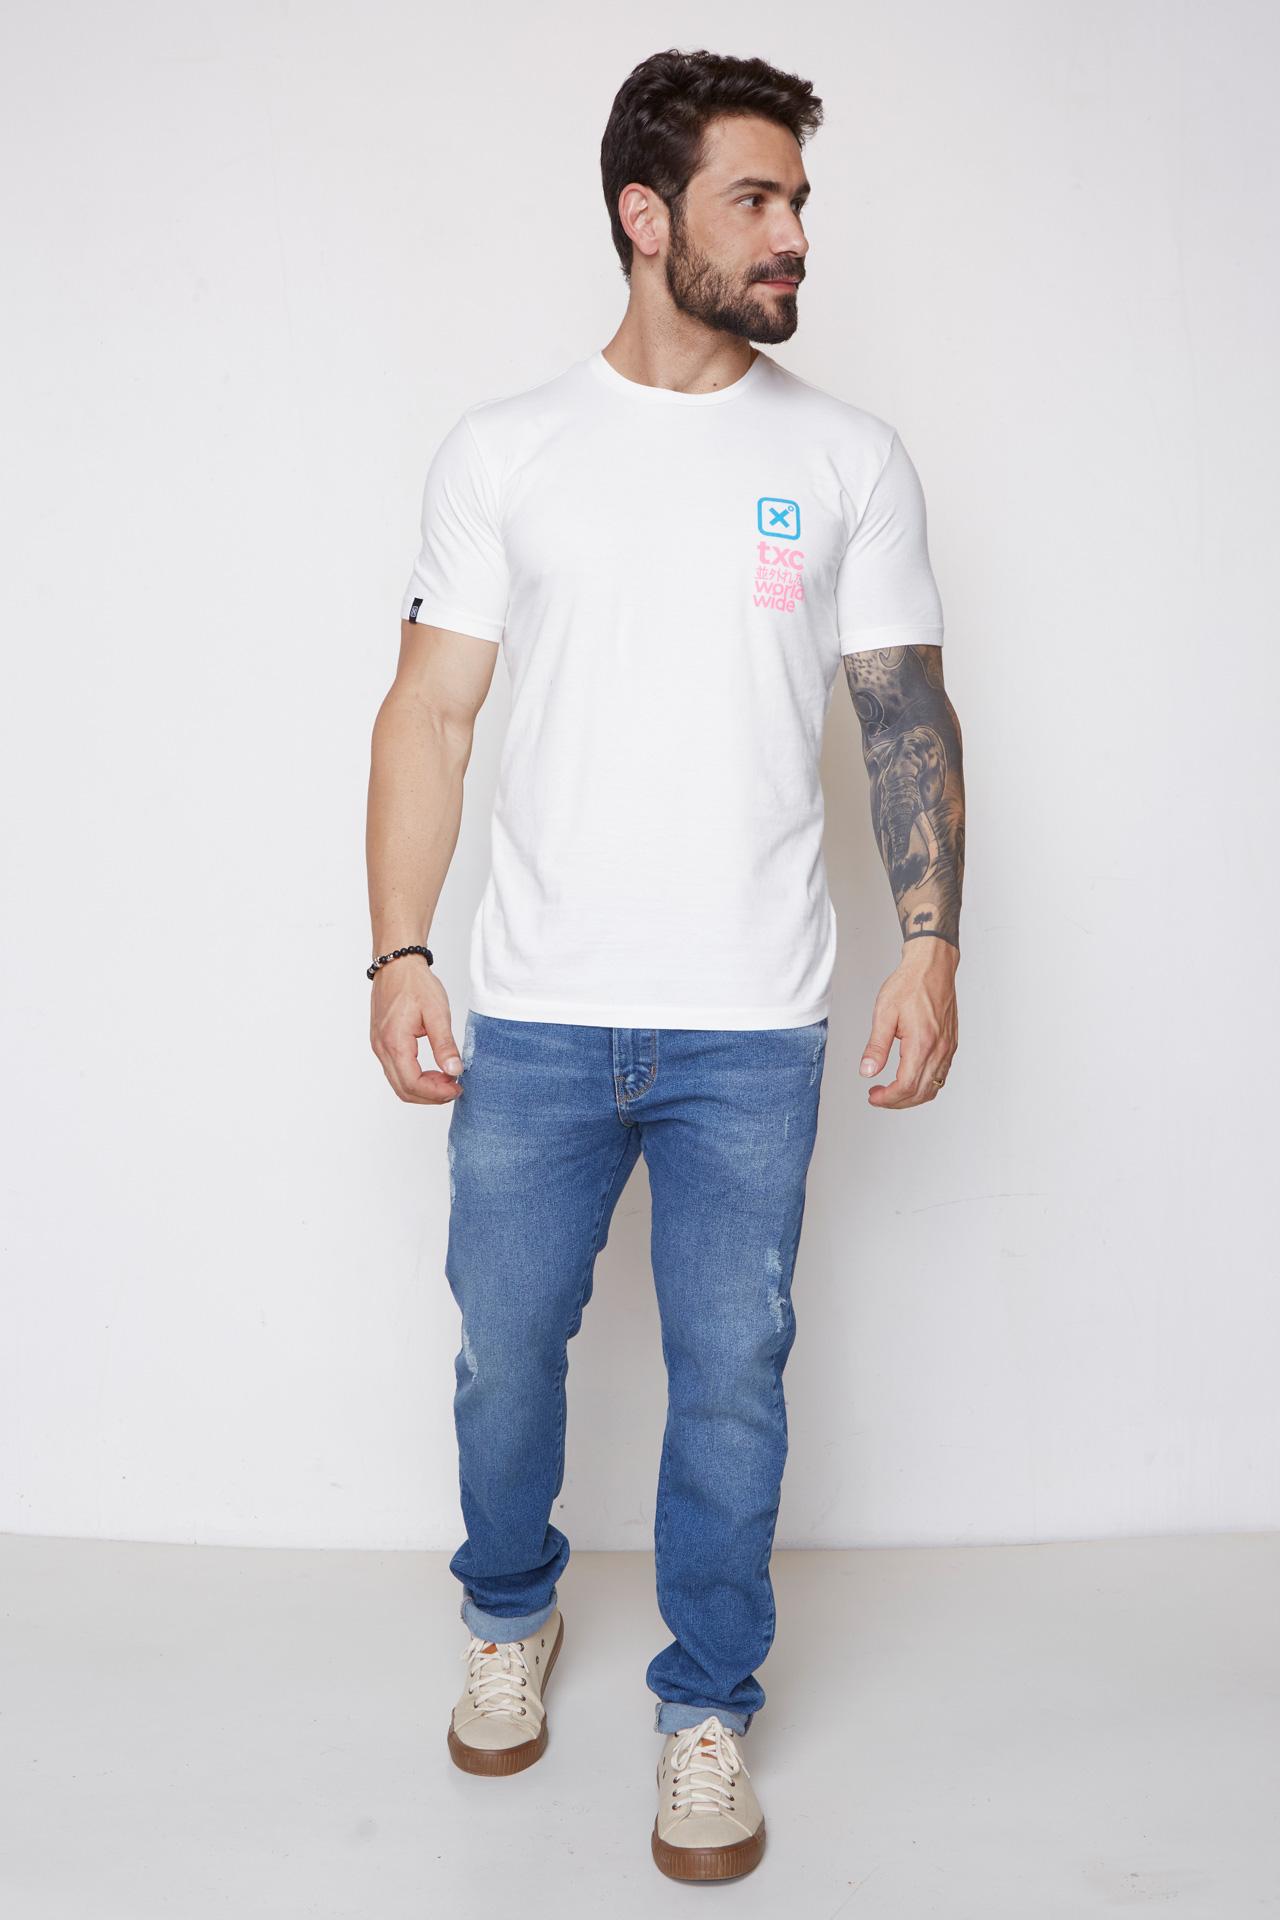 Camiseta Masculina TXC 19548